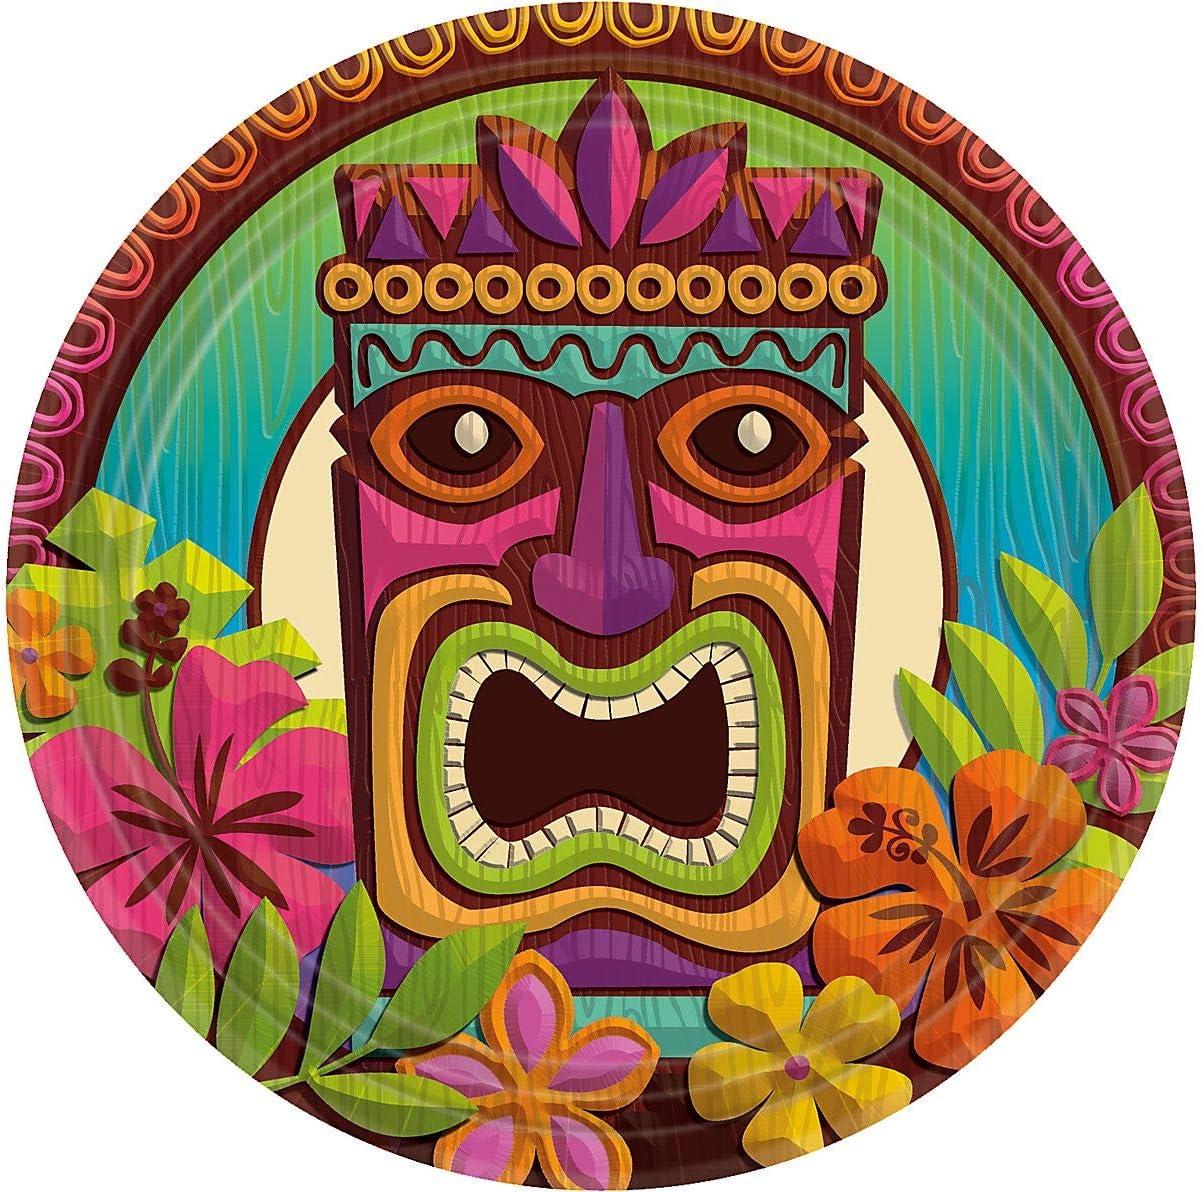 7 60 Ct. AmscanTropical Tiki Party Dessert Plates